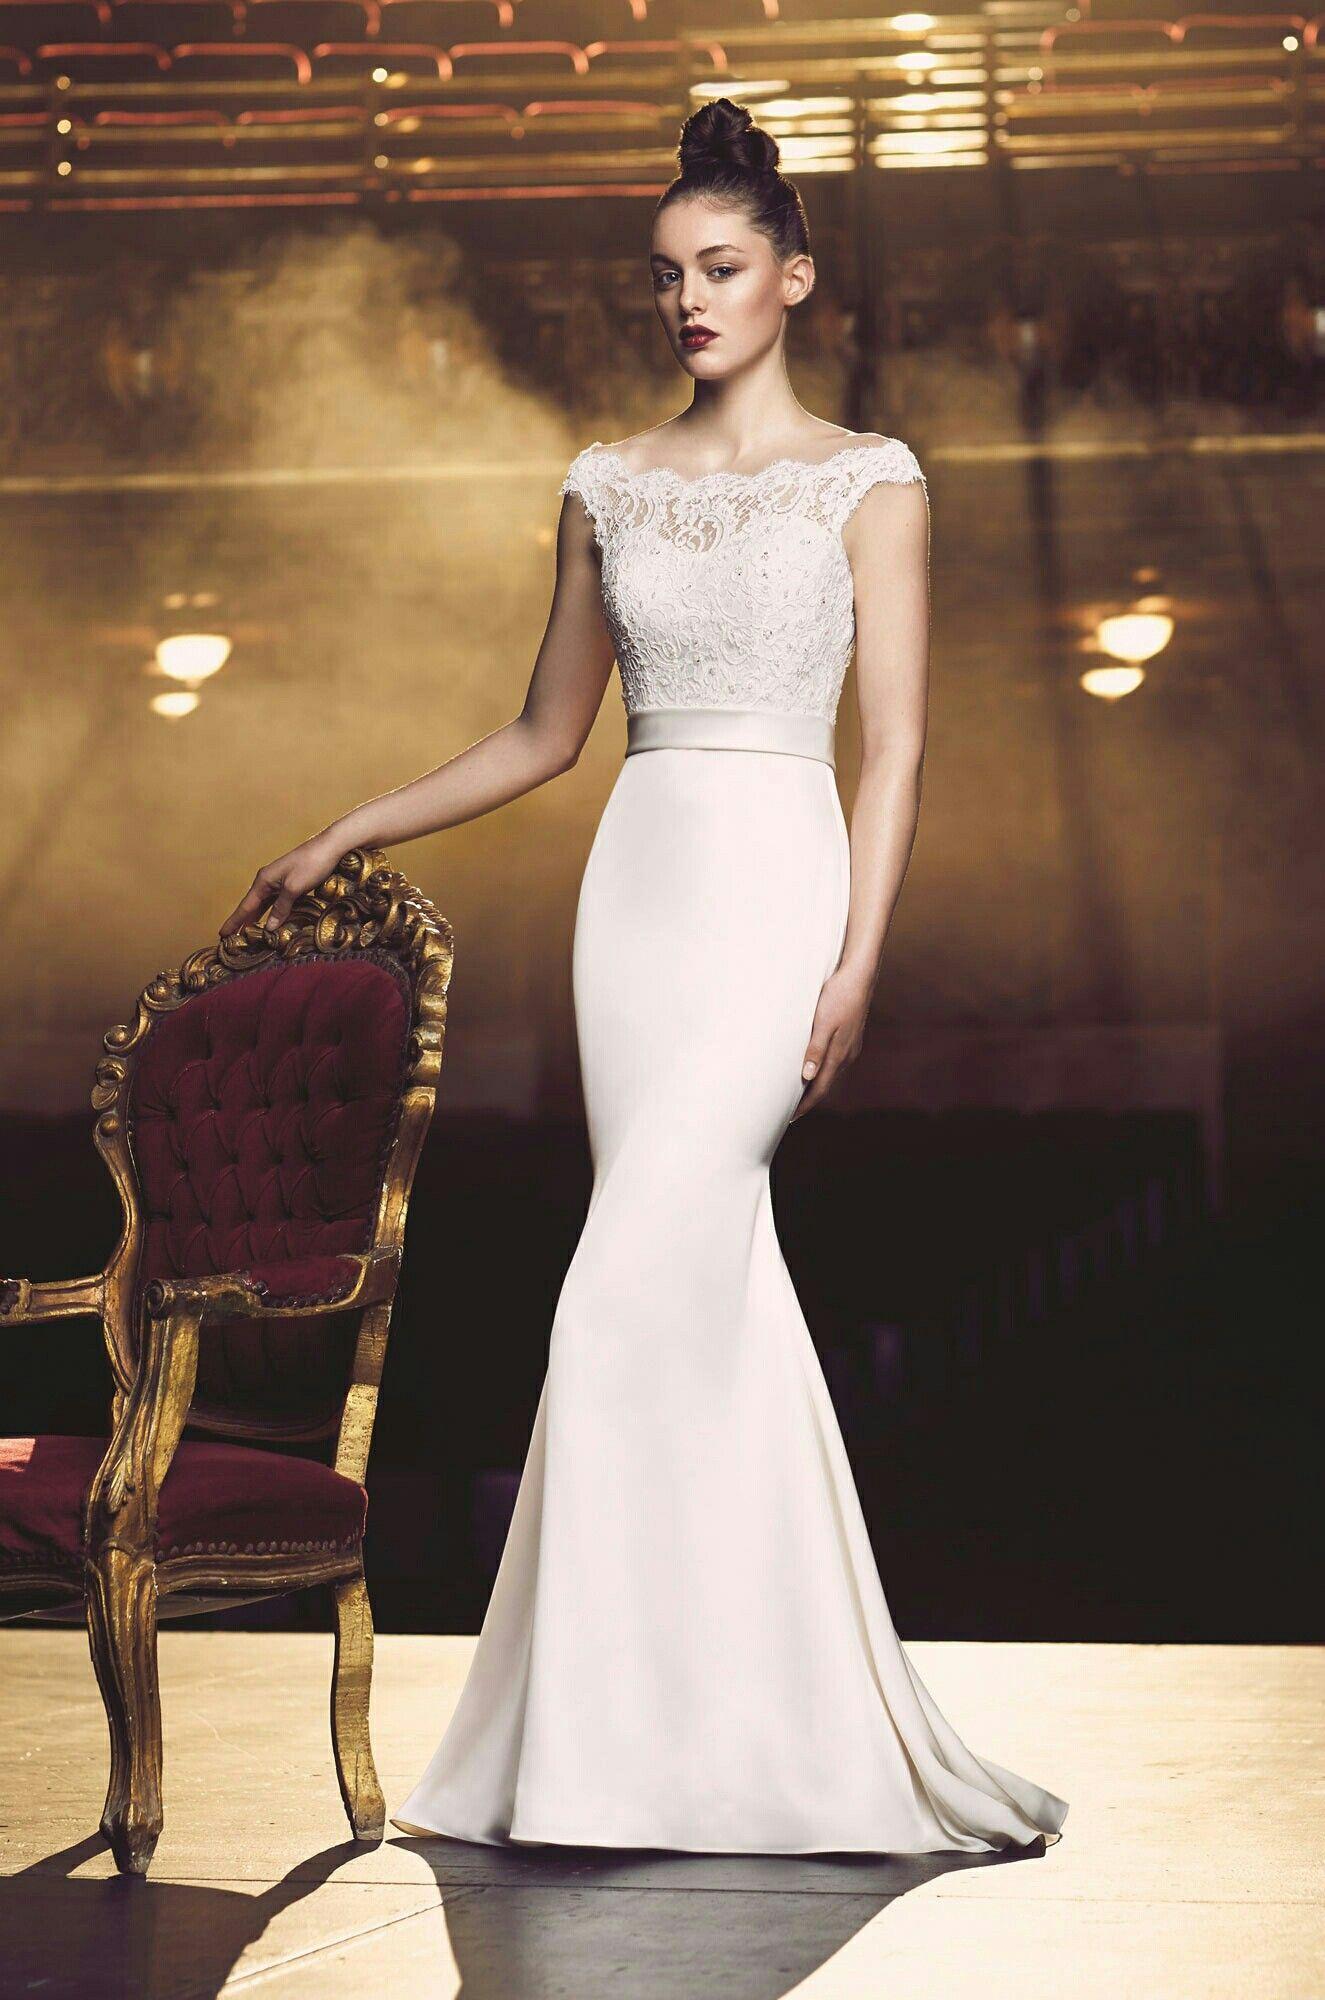 Paloma blanca wedding gowns bridal gownmermaidfishtail